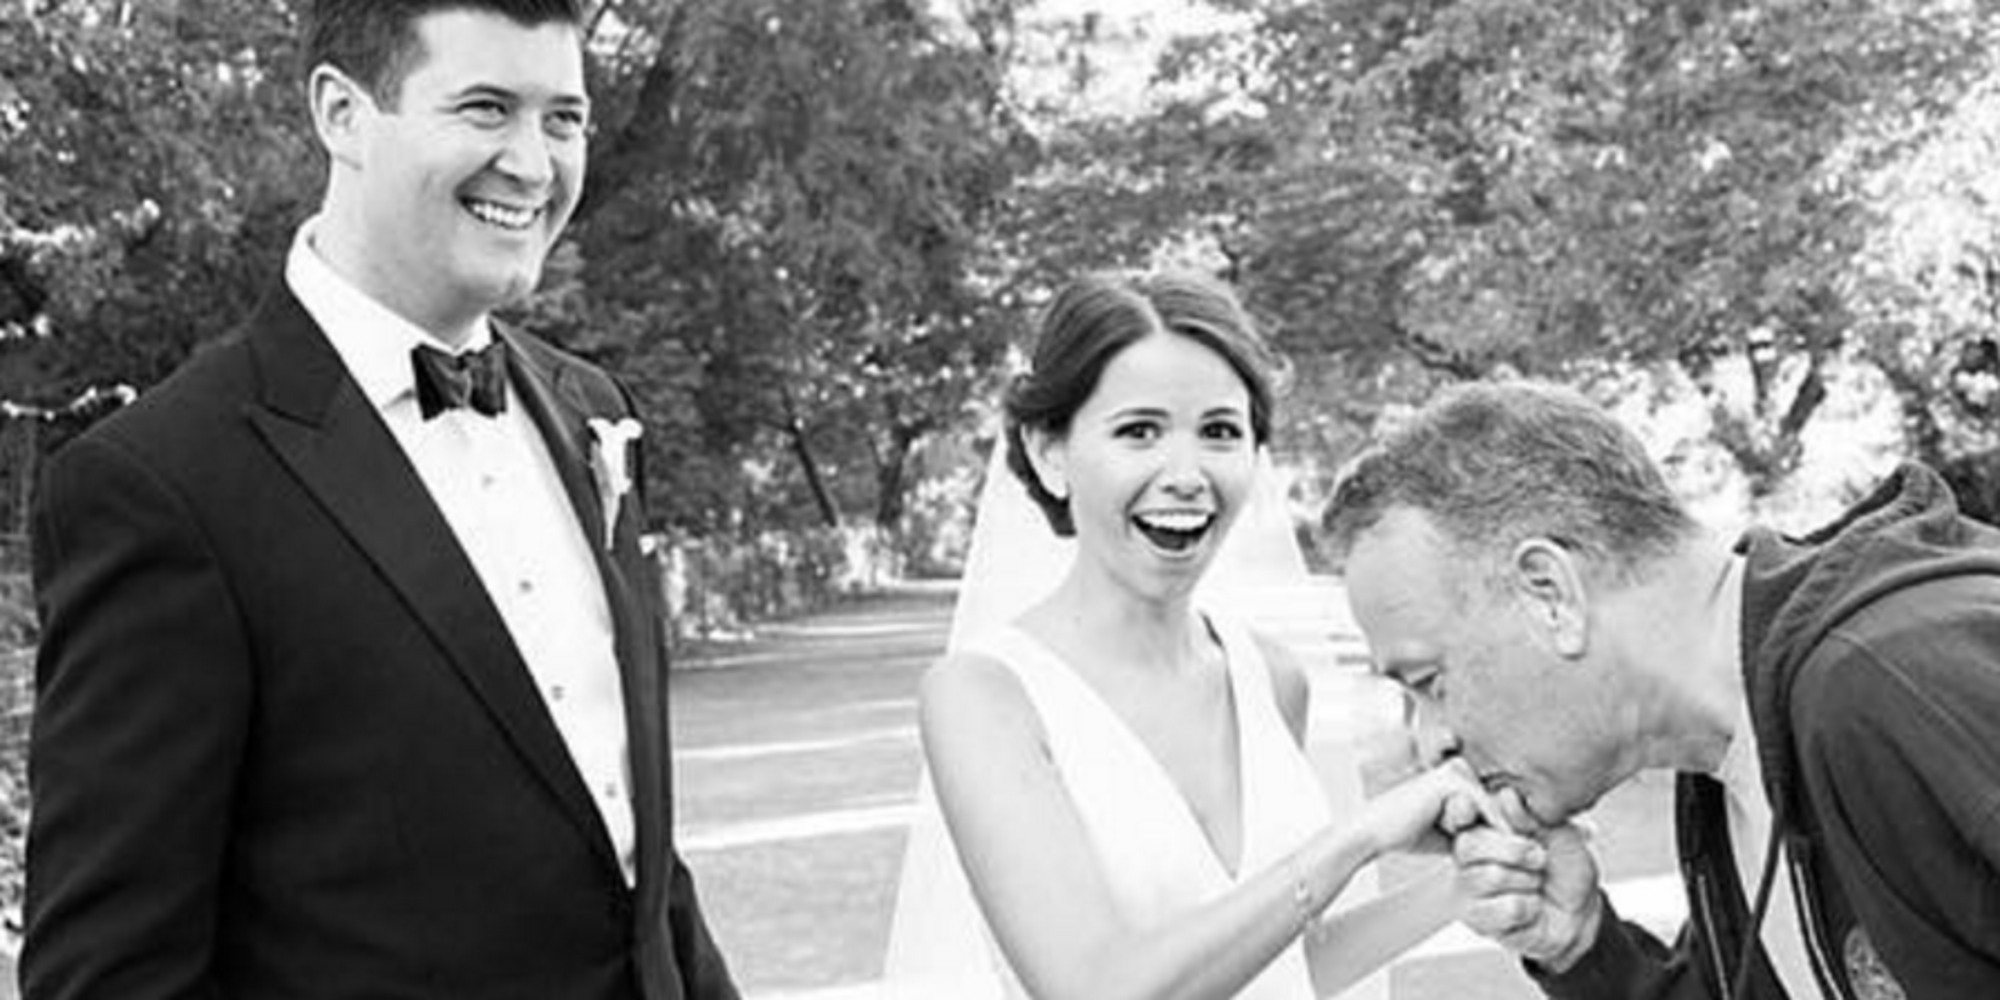 Gets Surprise When Tom Hanks Crashes Their Wedding Photos